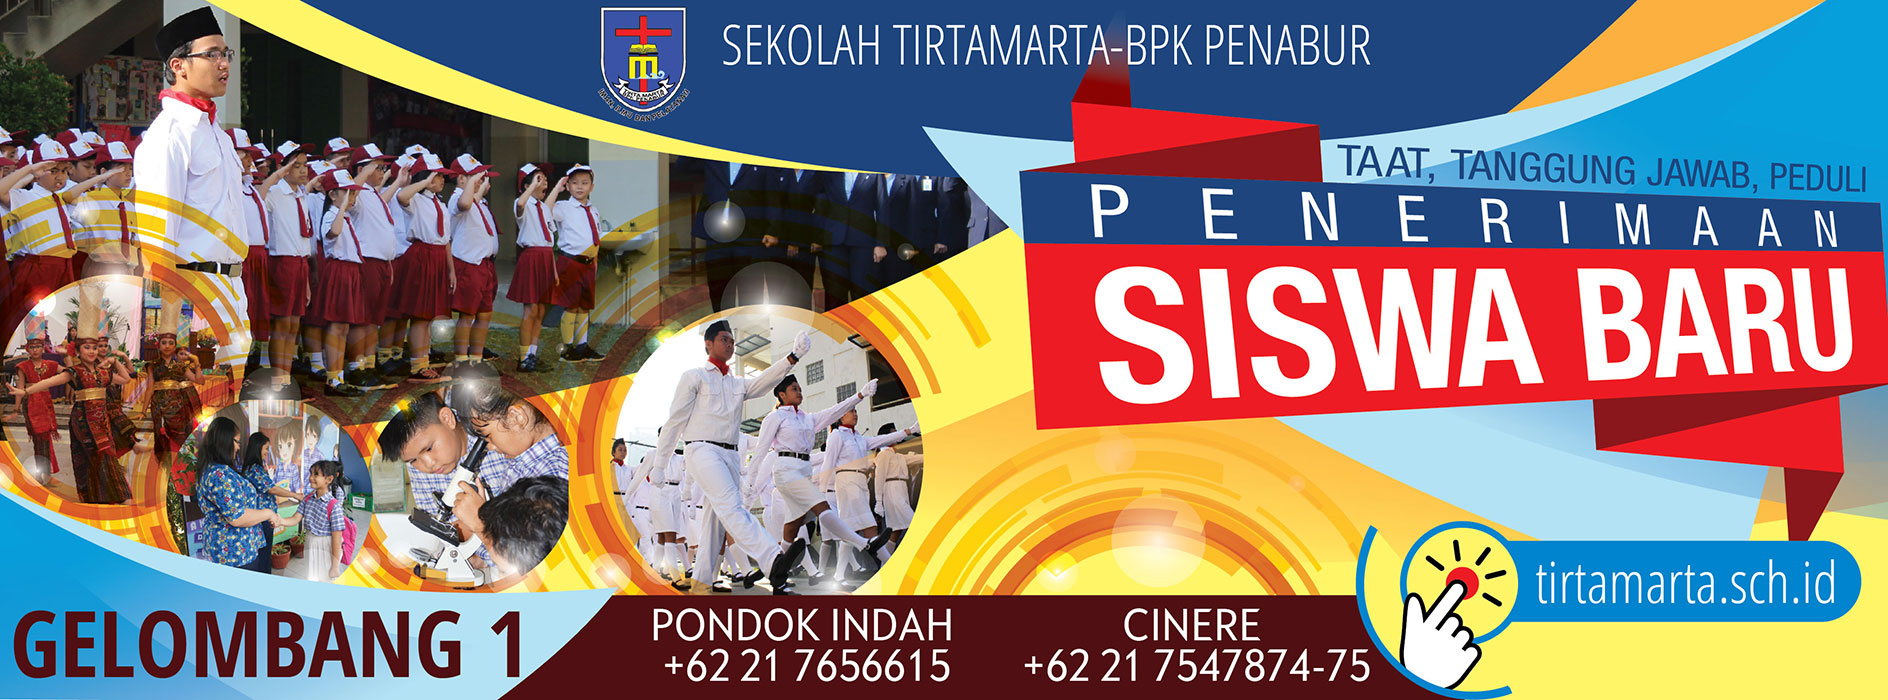 banner-ppsb-2017-gel1